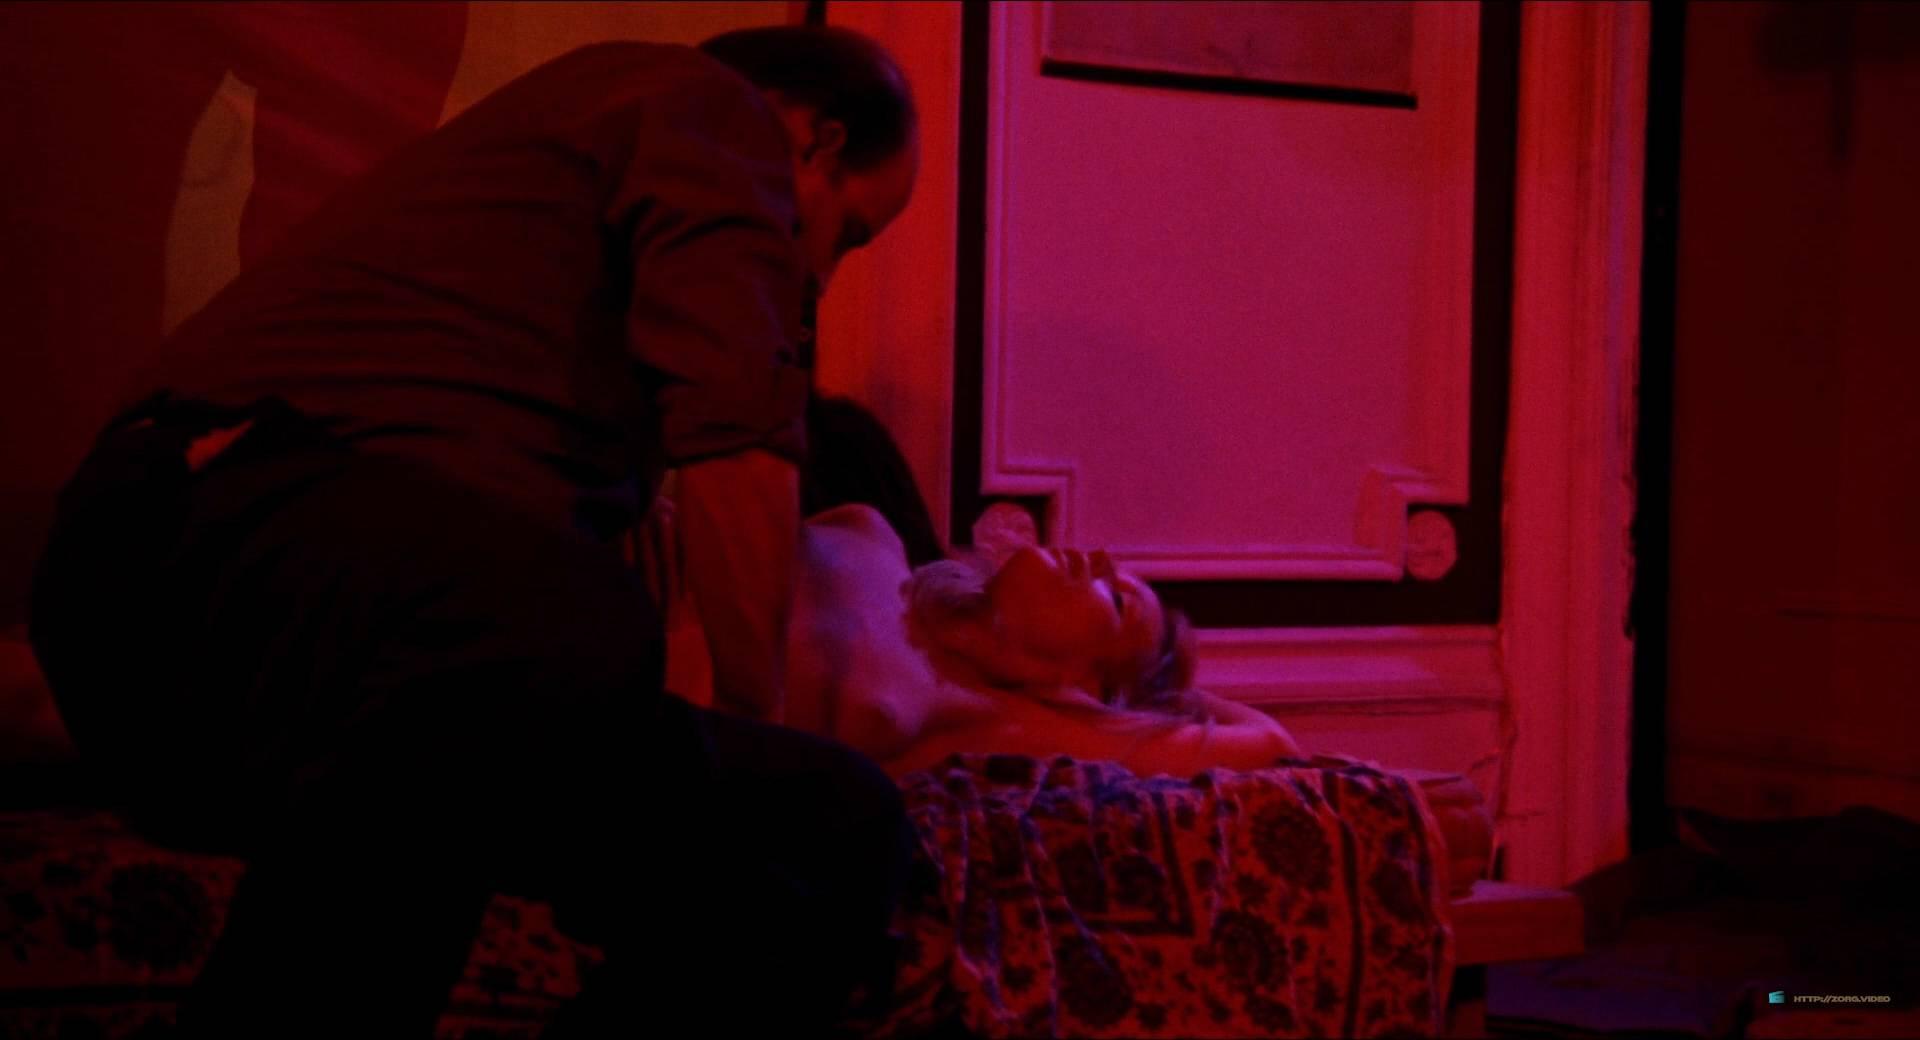 Susan Sarandon nude bush Francine Middleton, Max Couper, Patty Caton all nude butt and sex - Joe (1970) HD 1080p BluRay (7)